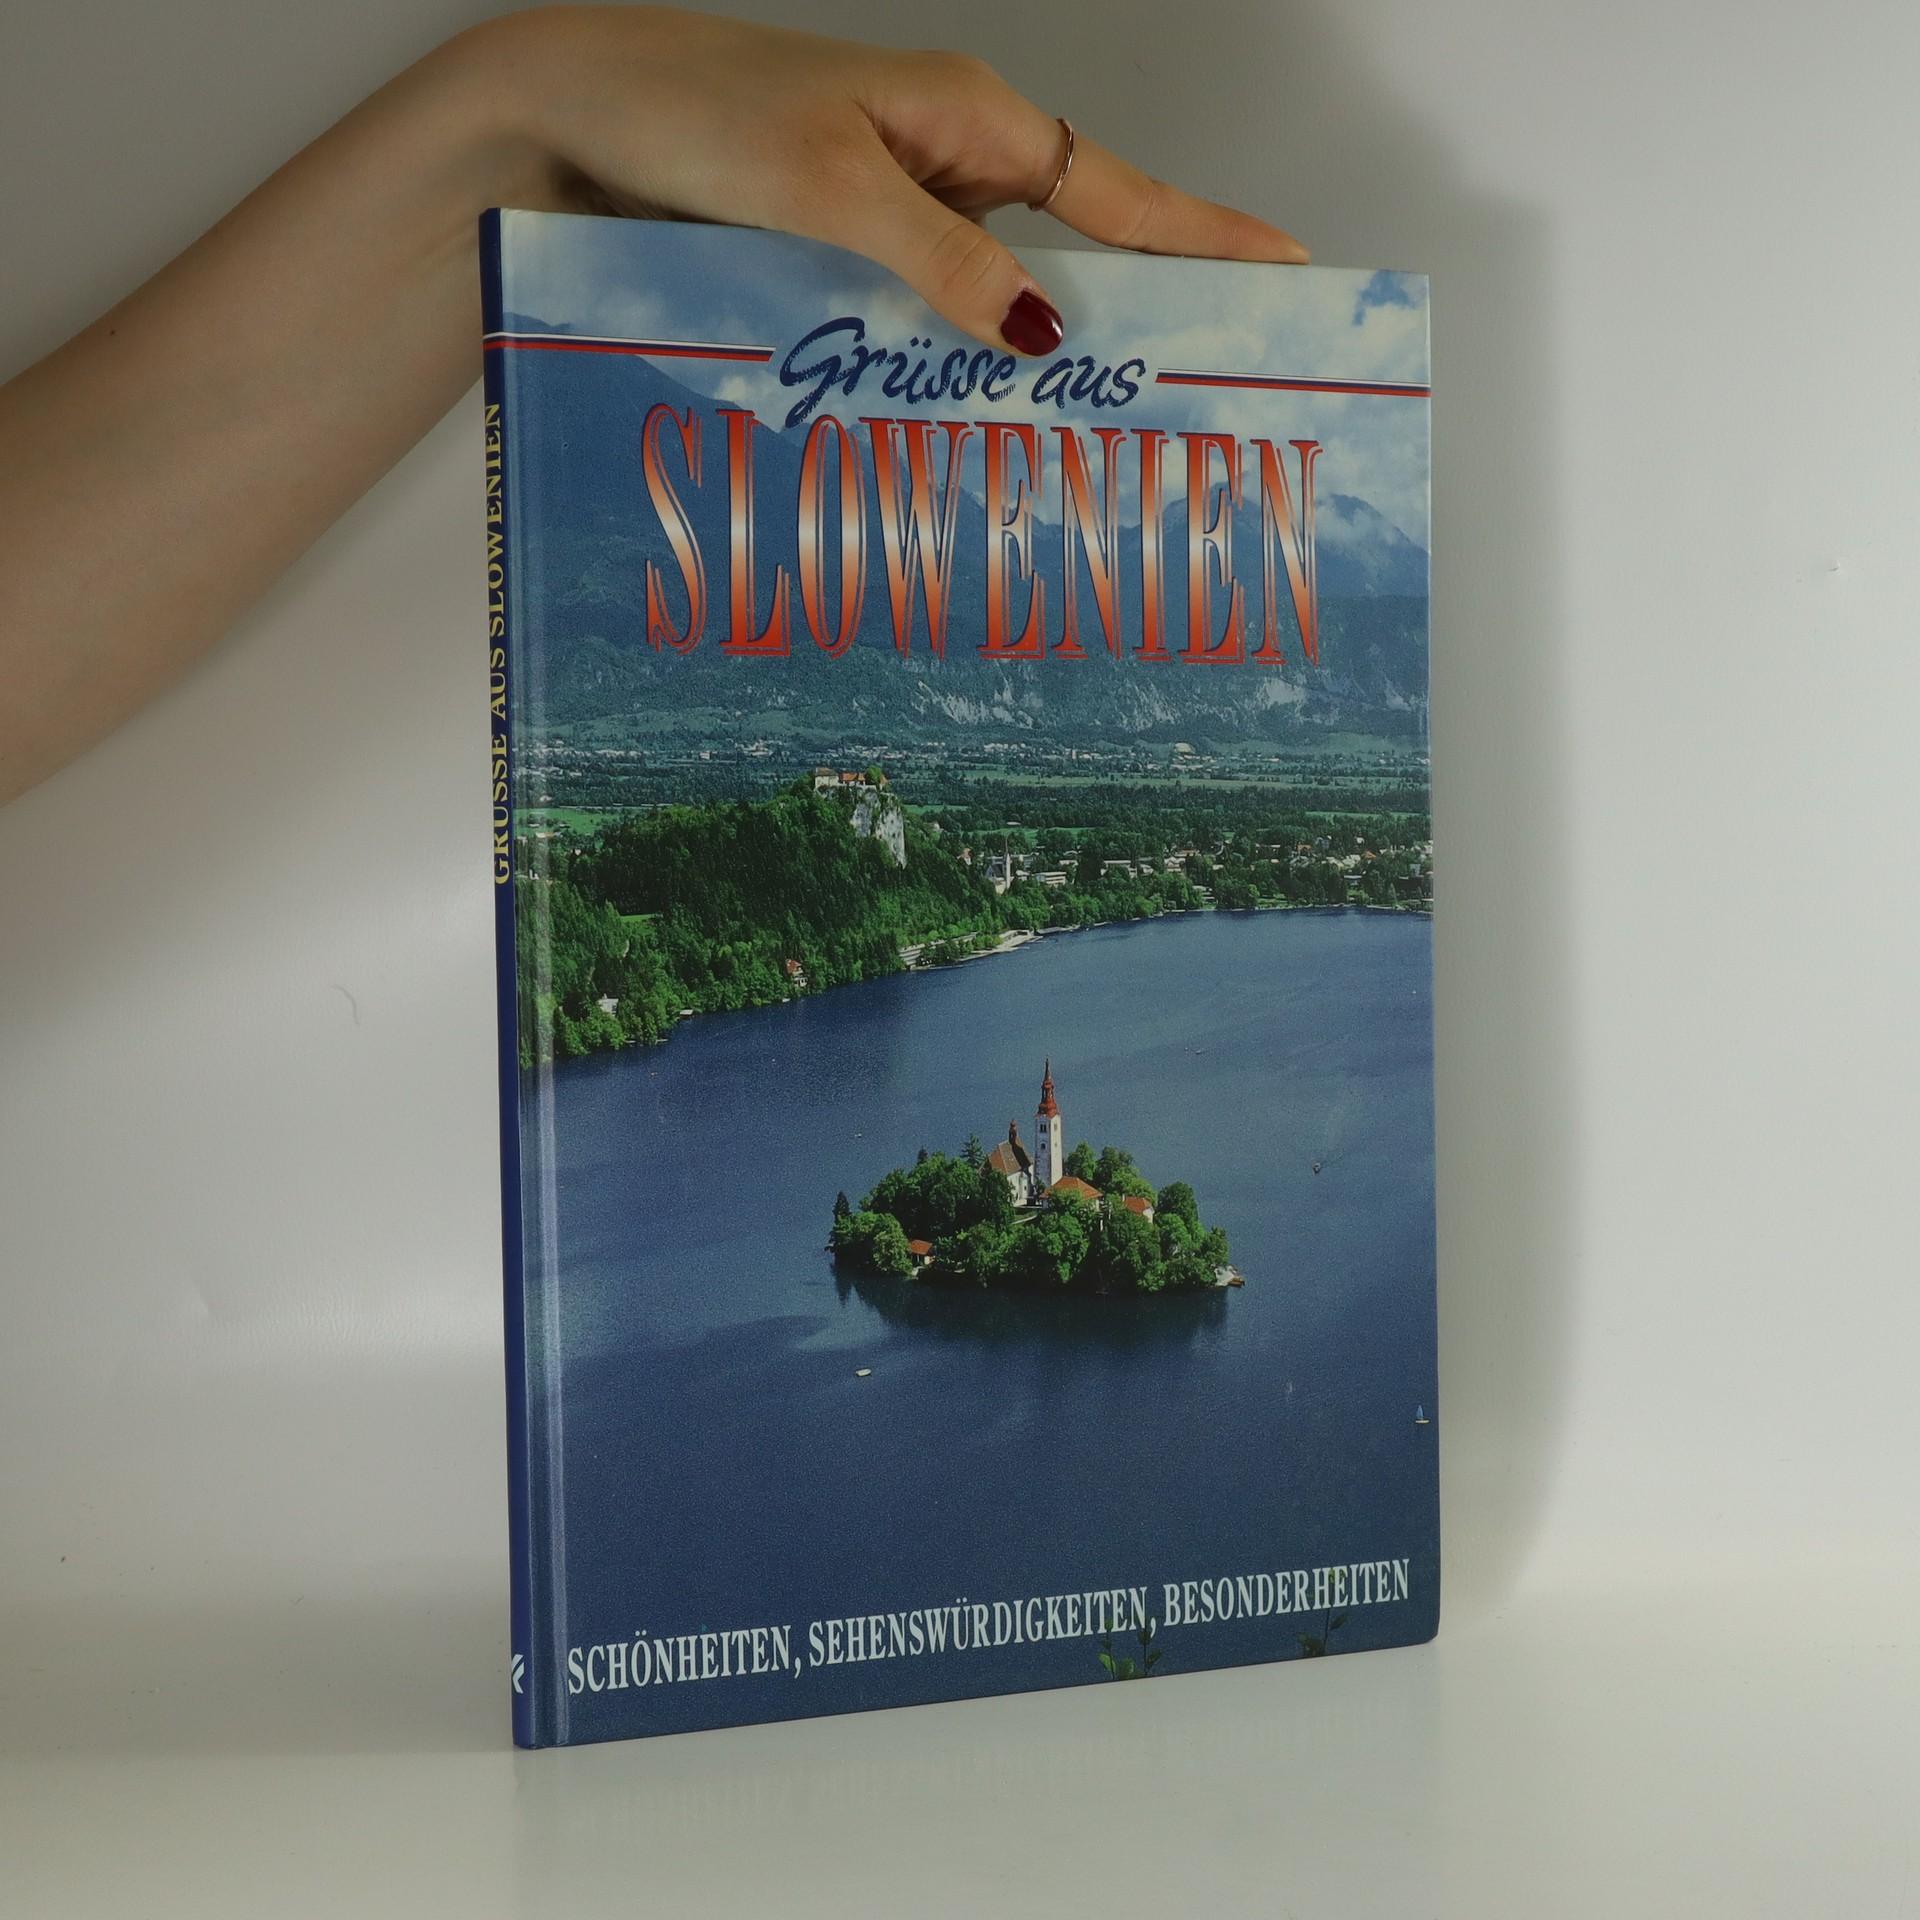 antikvární kniha Grüsse aus Slowenien, 1996